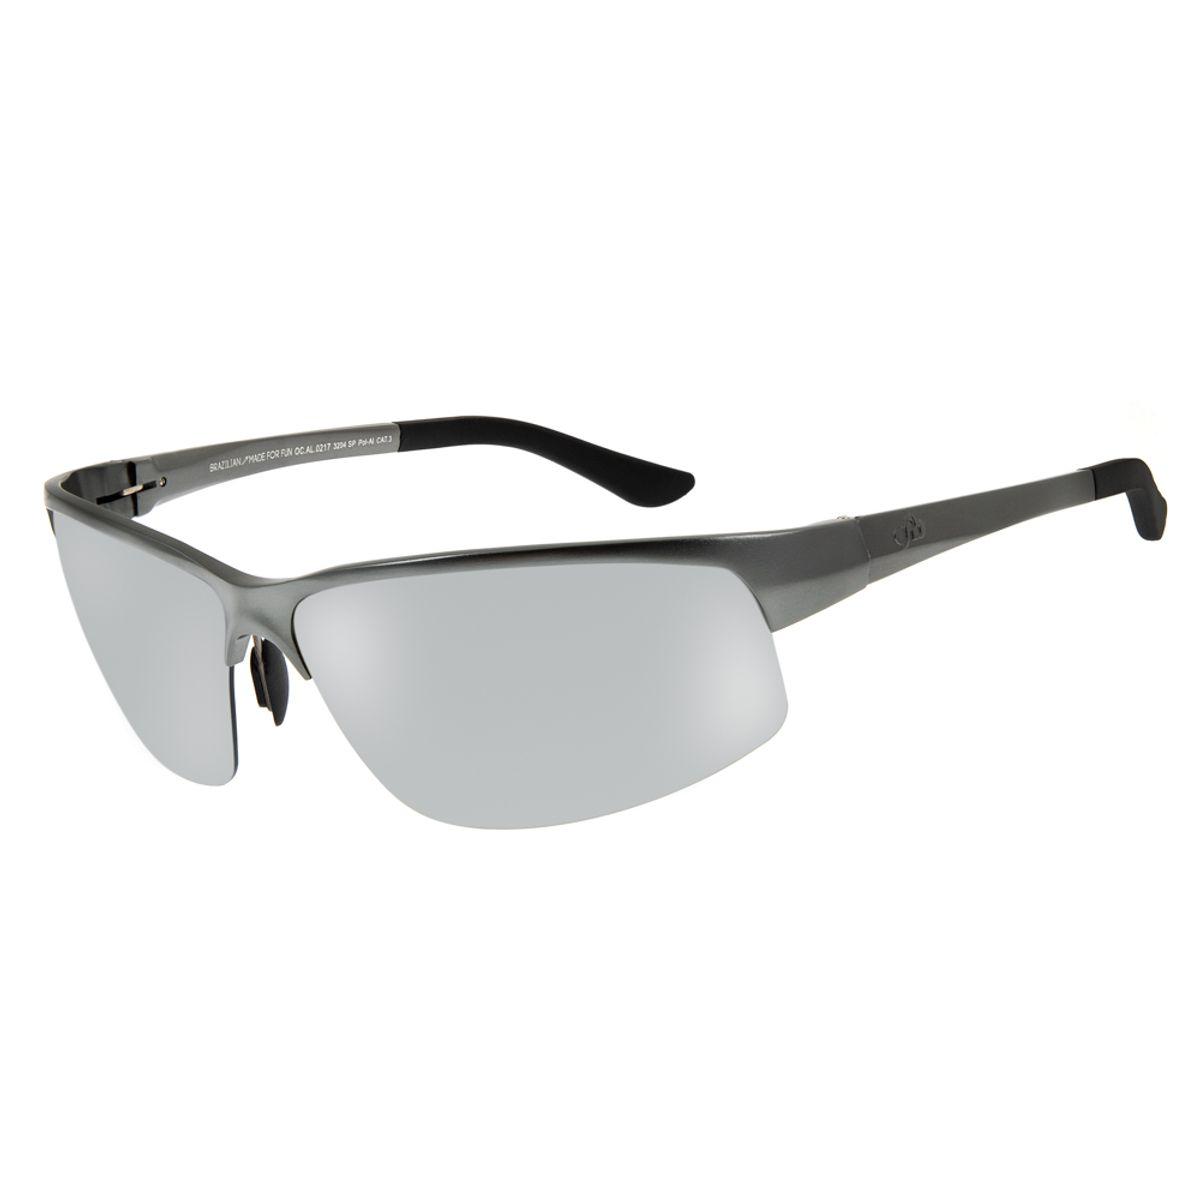 1cb4dfacb OC.AL.0217.3204 - Óculos de Sol Masculino Chilli Beans Esportivo ...